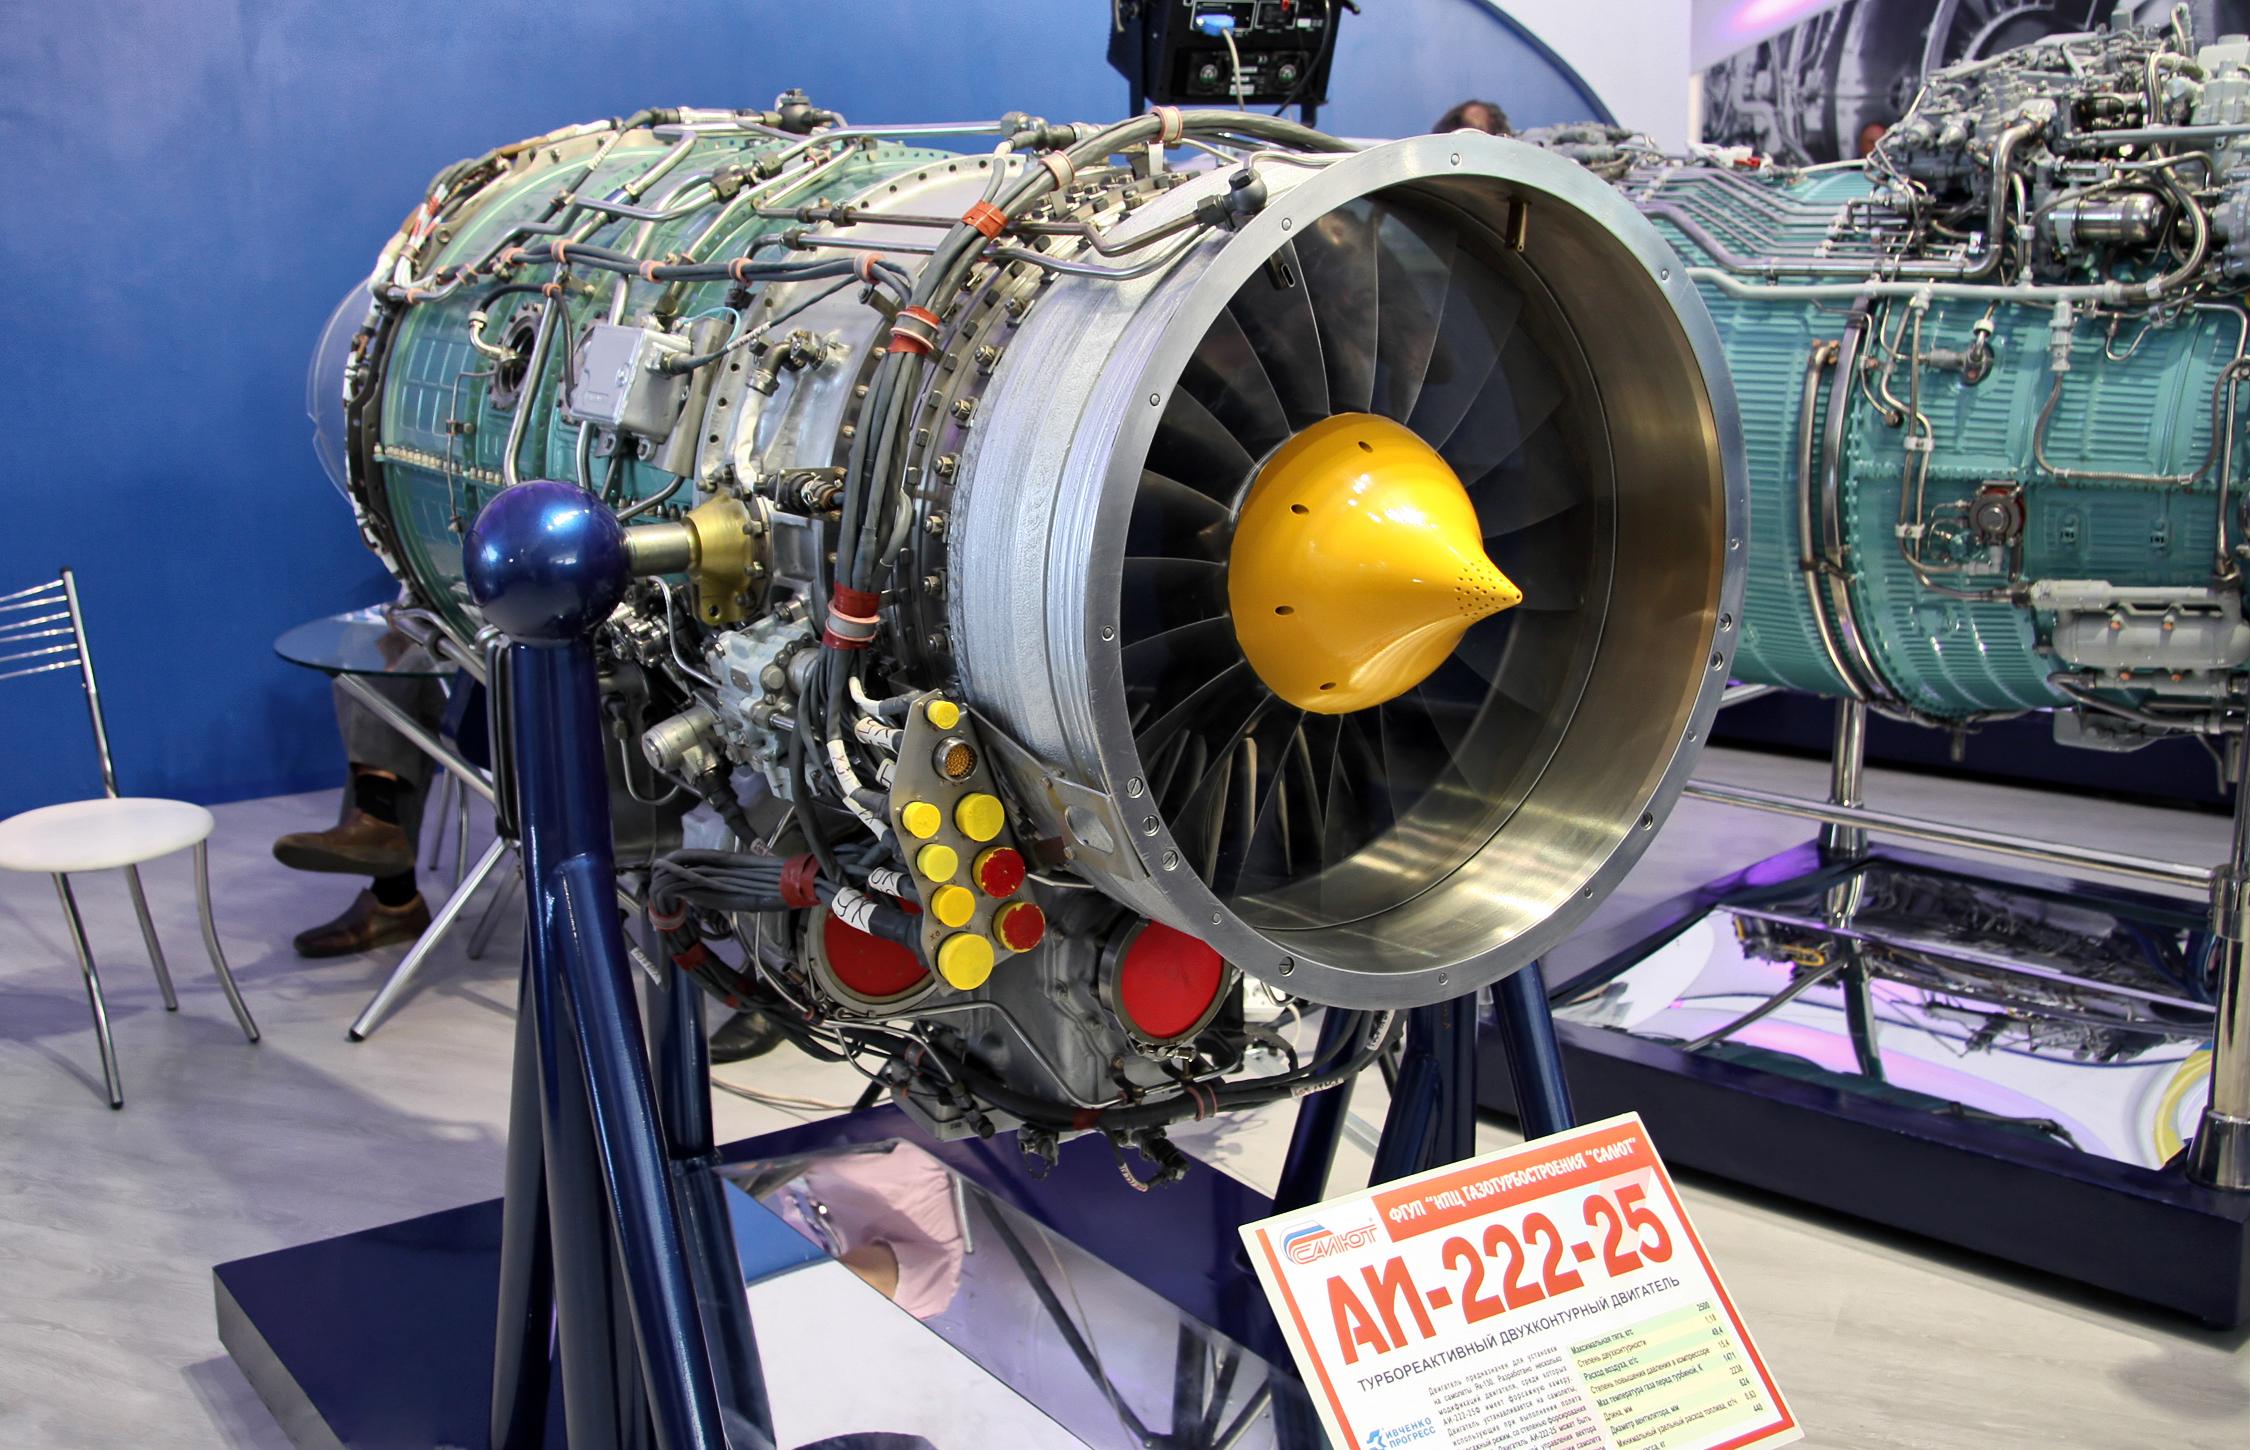 AI-222-25_MAKS-2011.jpg